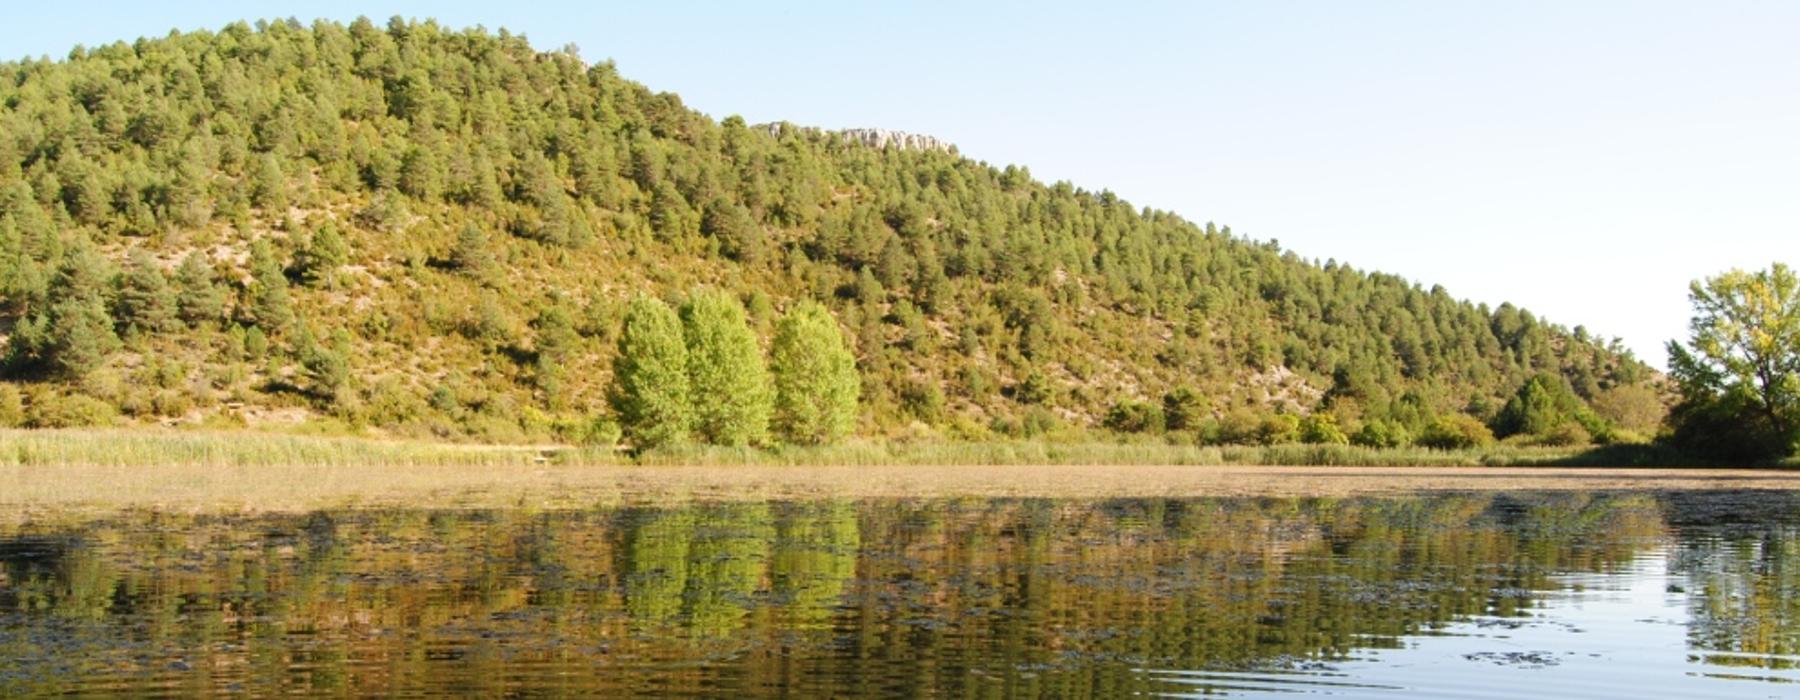 Vista de la laguna del Marquesado